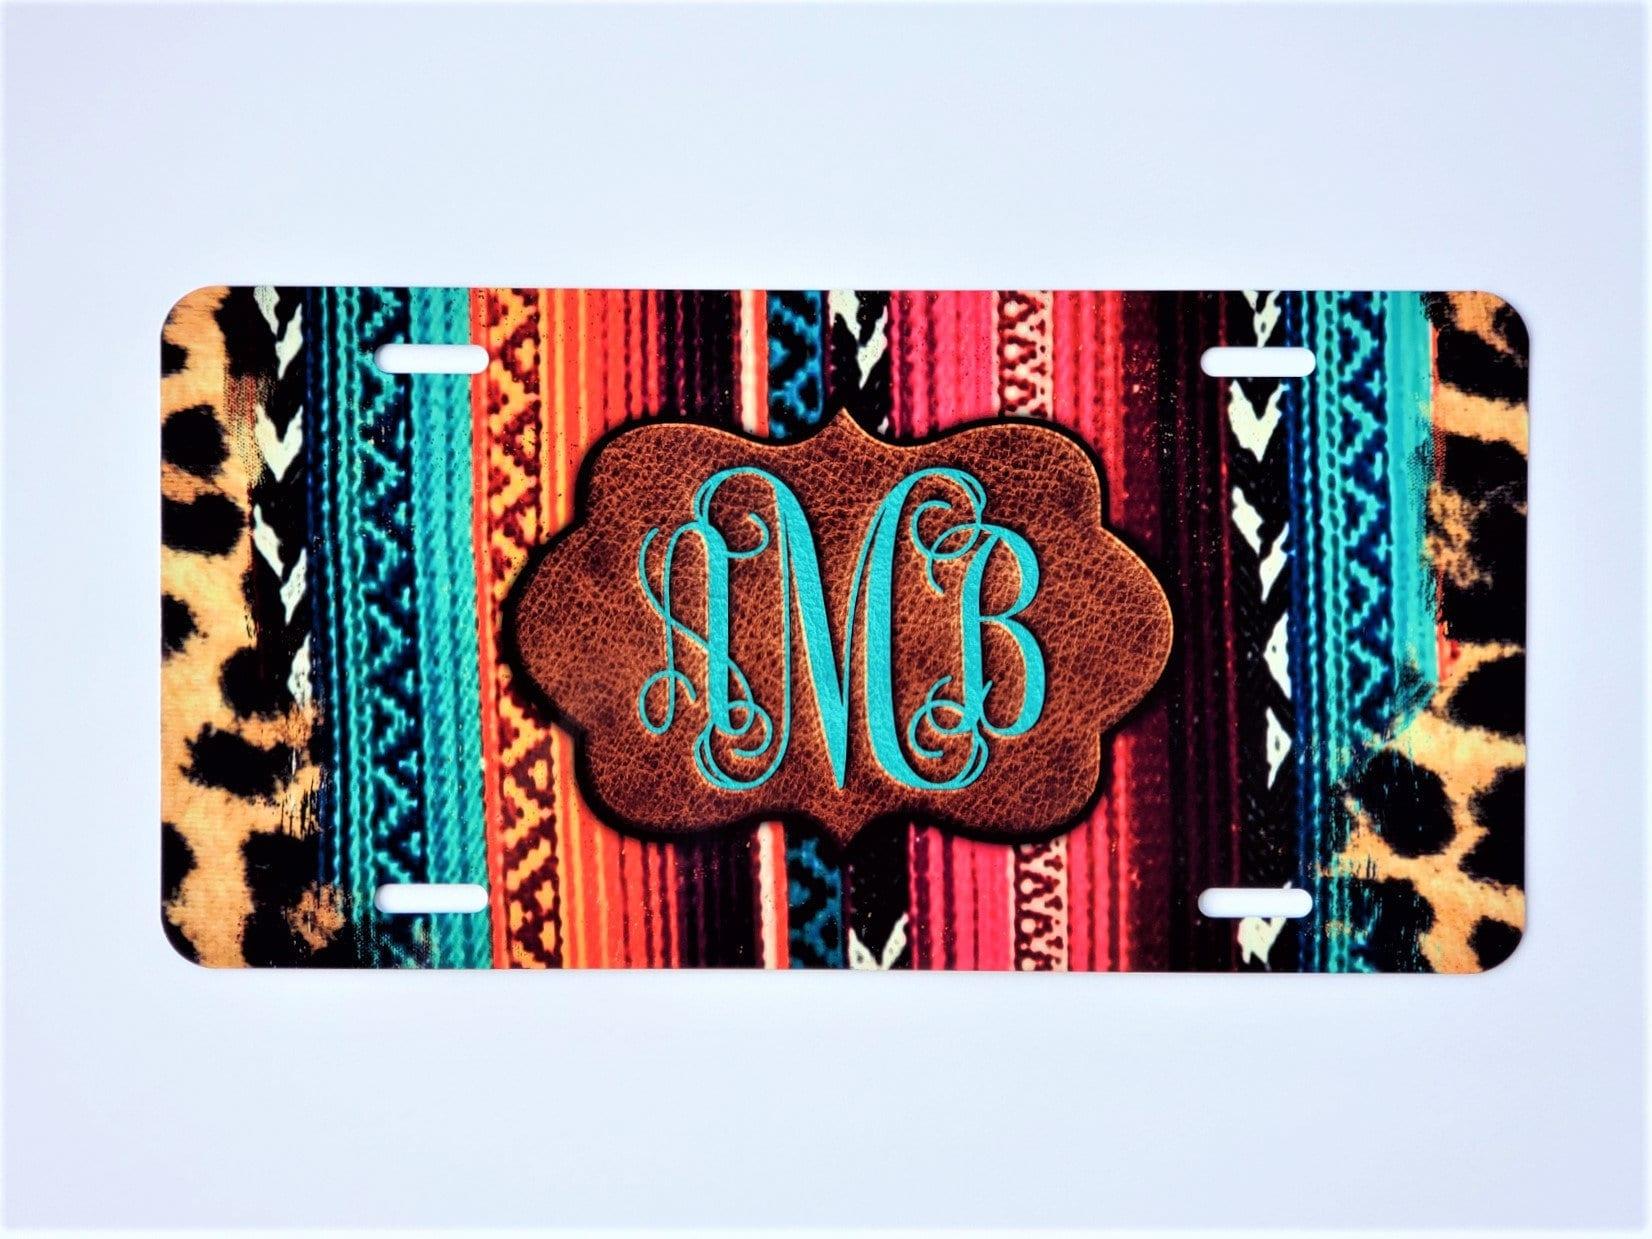 Personalized Front License Plate, Monogram Custom License Plate, Leopard Print, Mexican Serape Blanket, Branded Leather, Custom Vanity Plate